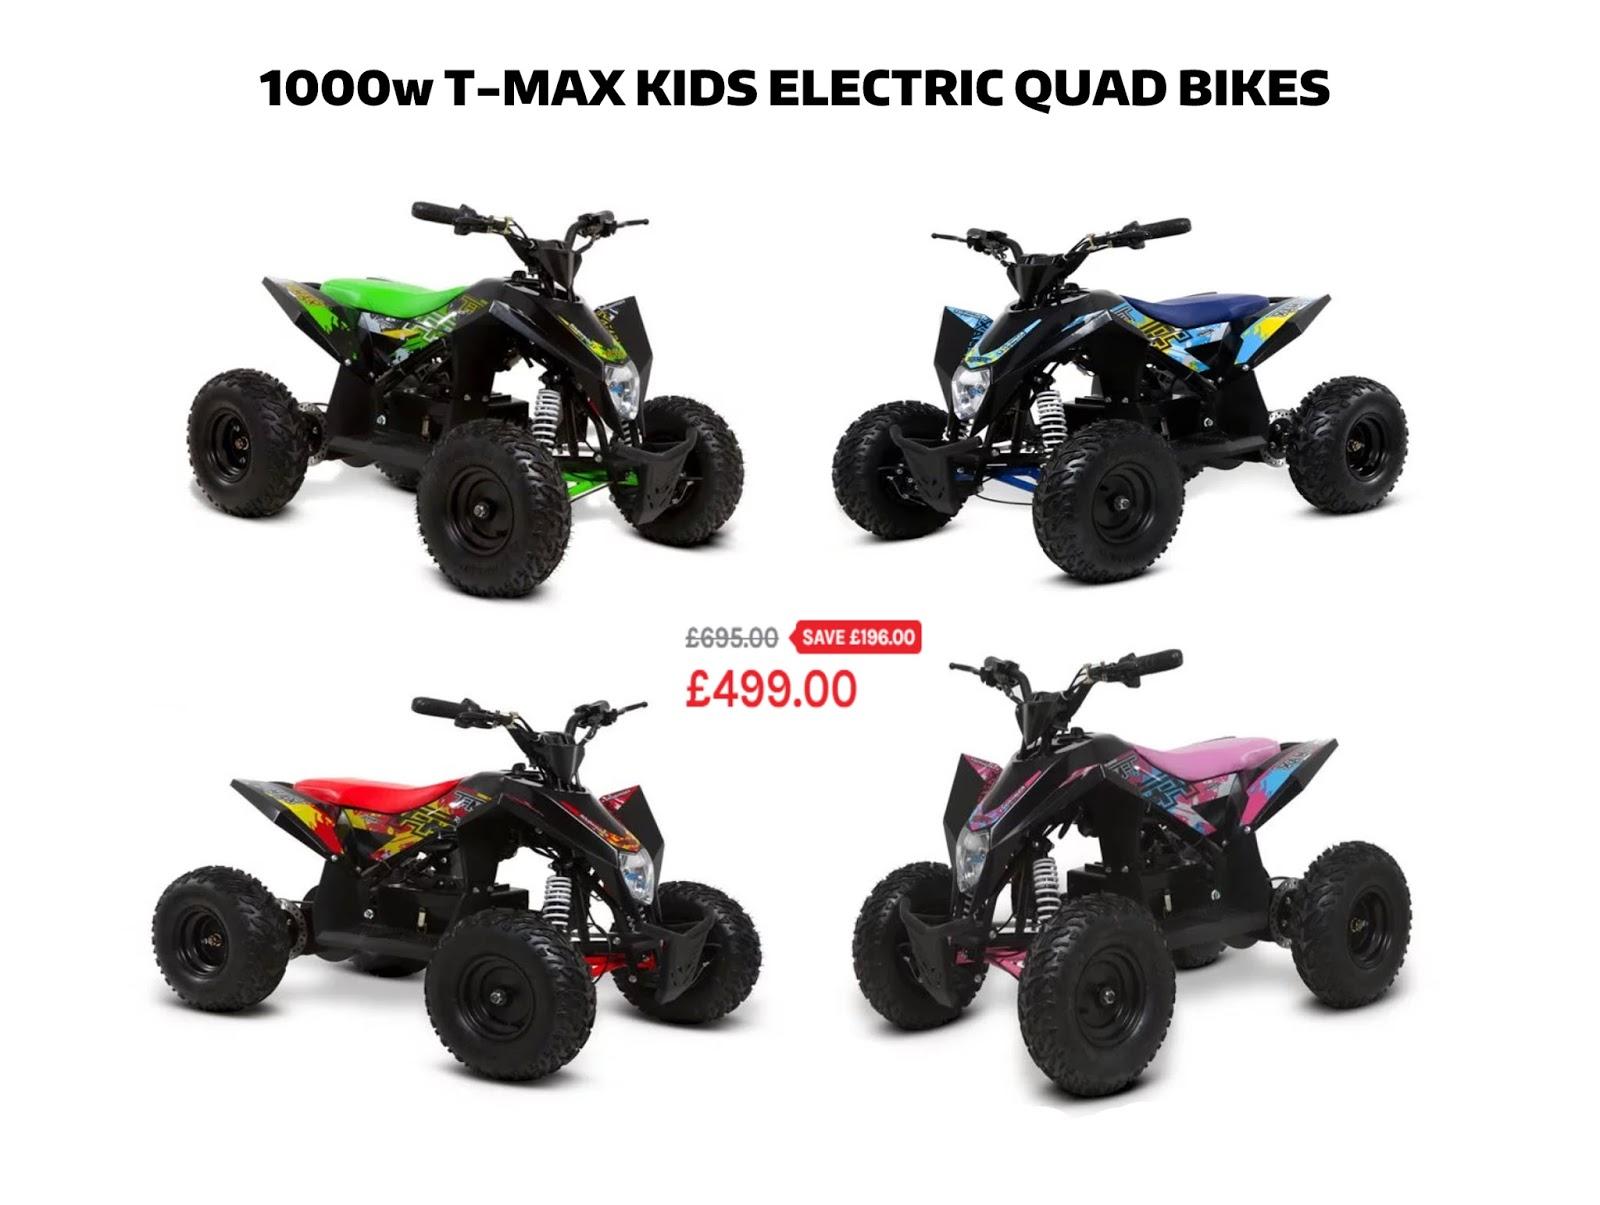 FunBikes Quads and Mini Motos: Kids Quad Bikes On Sale Now